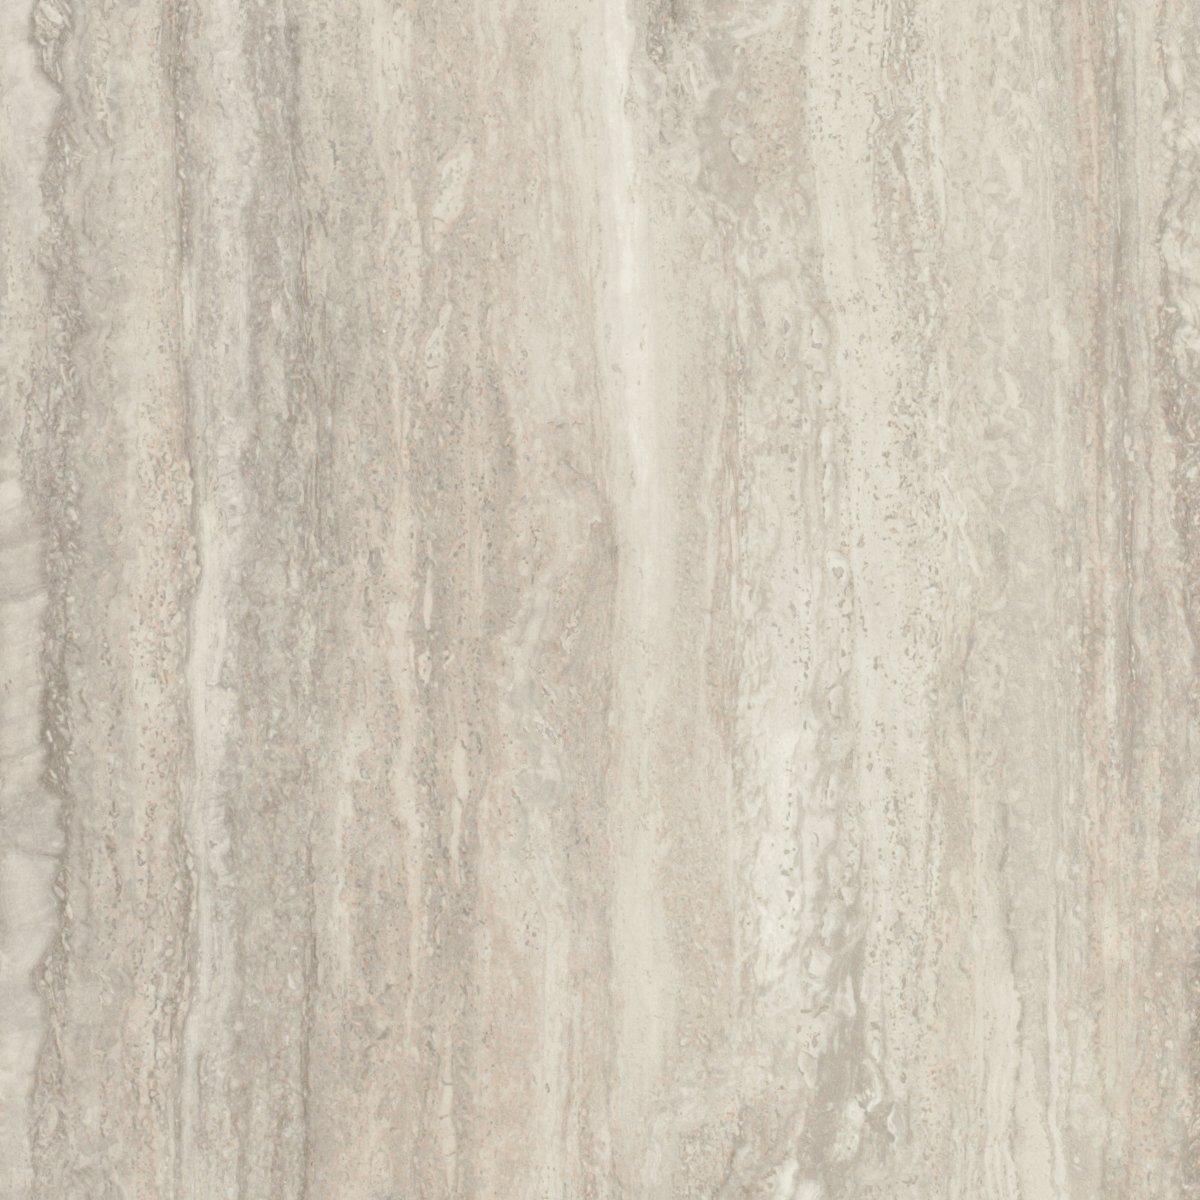 Formica Brand Laminate 034581234710000 Travertine Silver Laminate, Travertine Silver Scovato